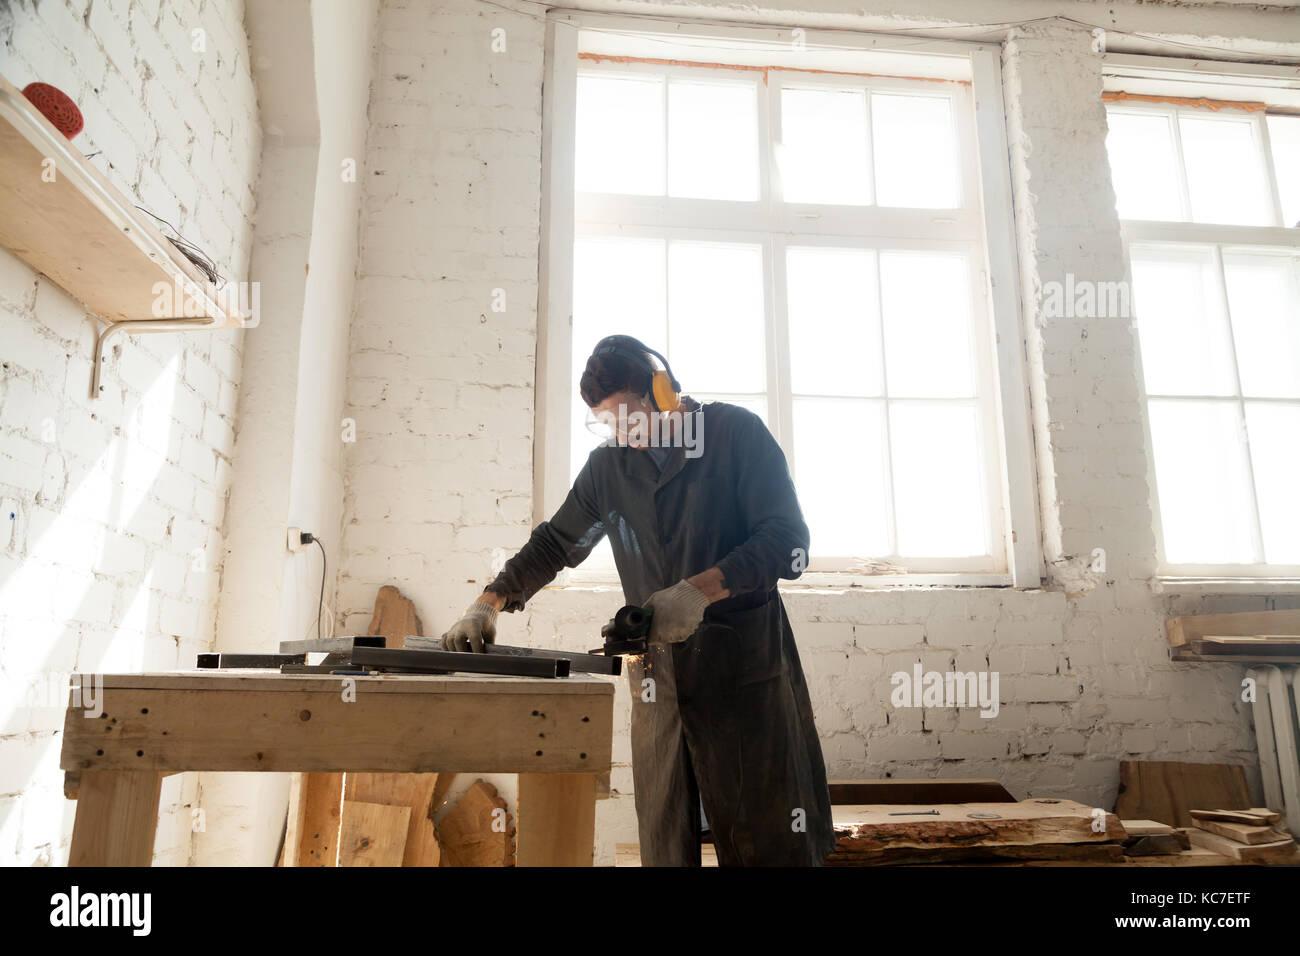 Carpenter works in custom furniture manufacturing - Stock Image